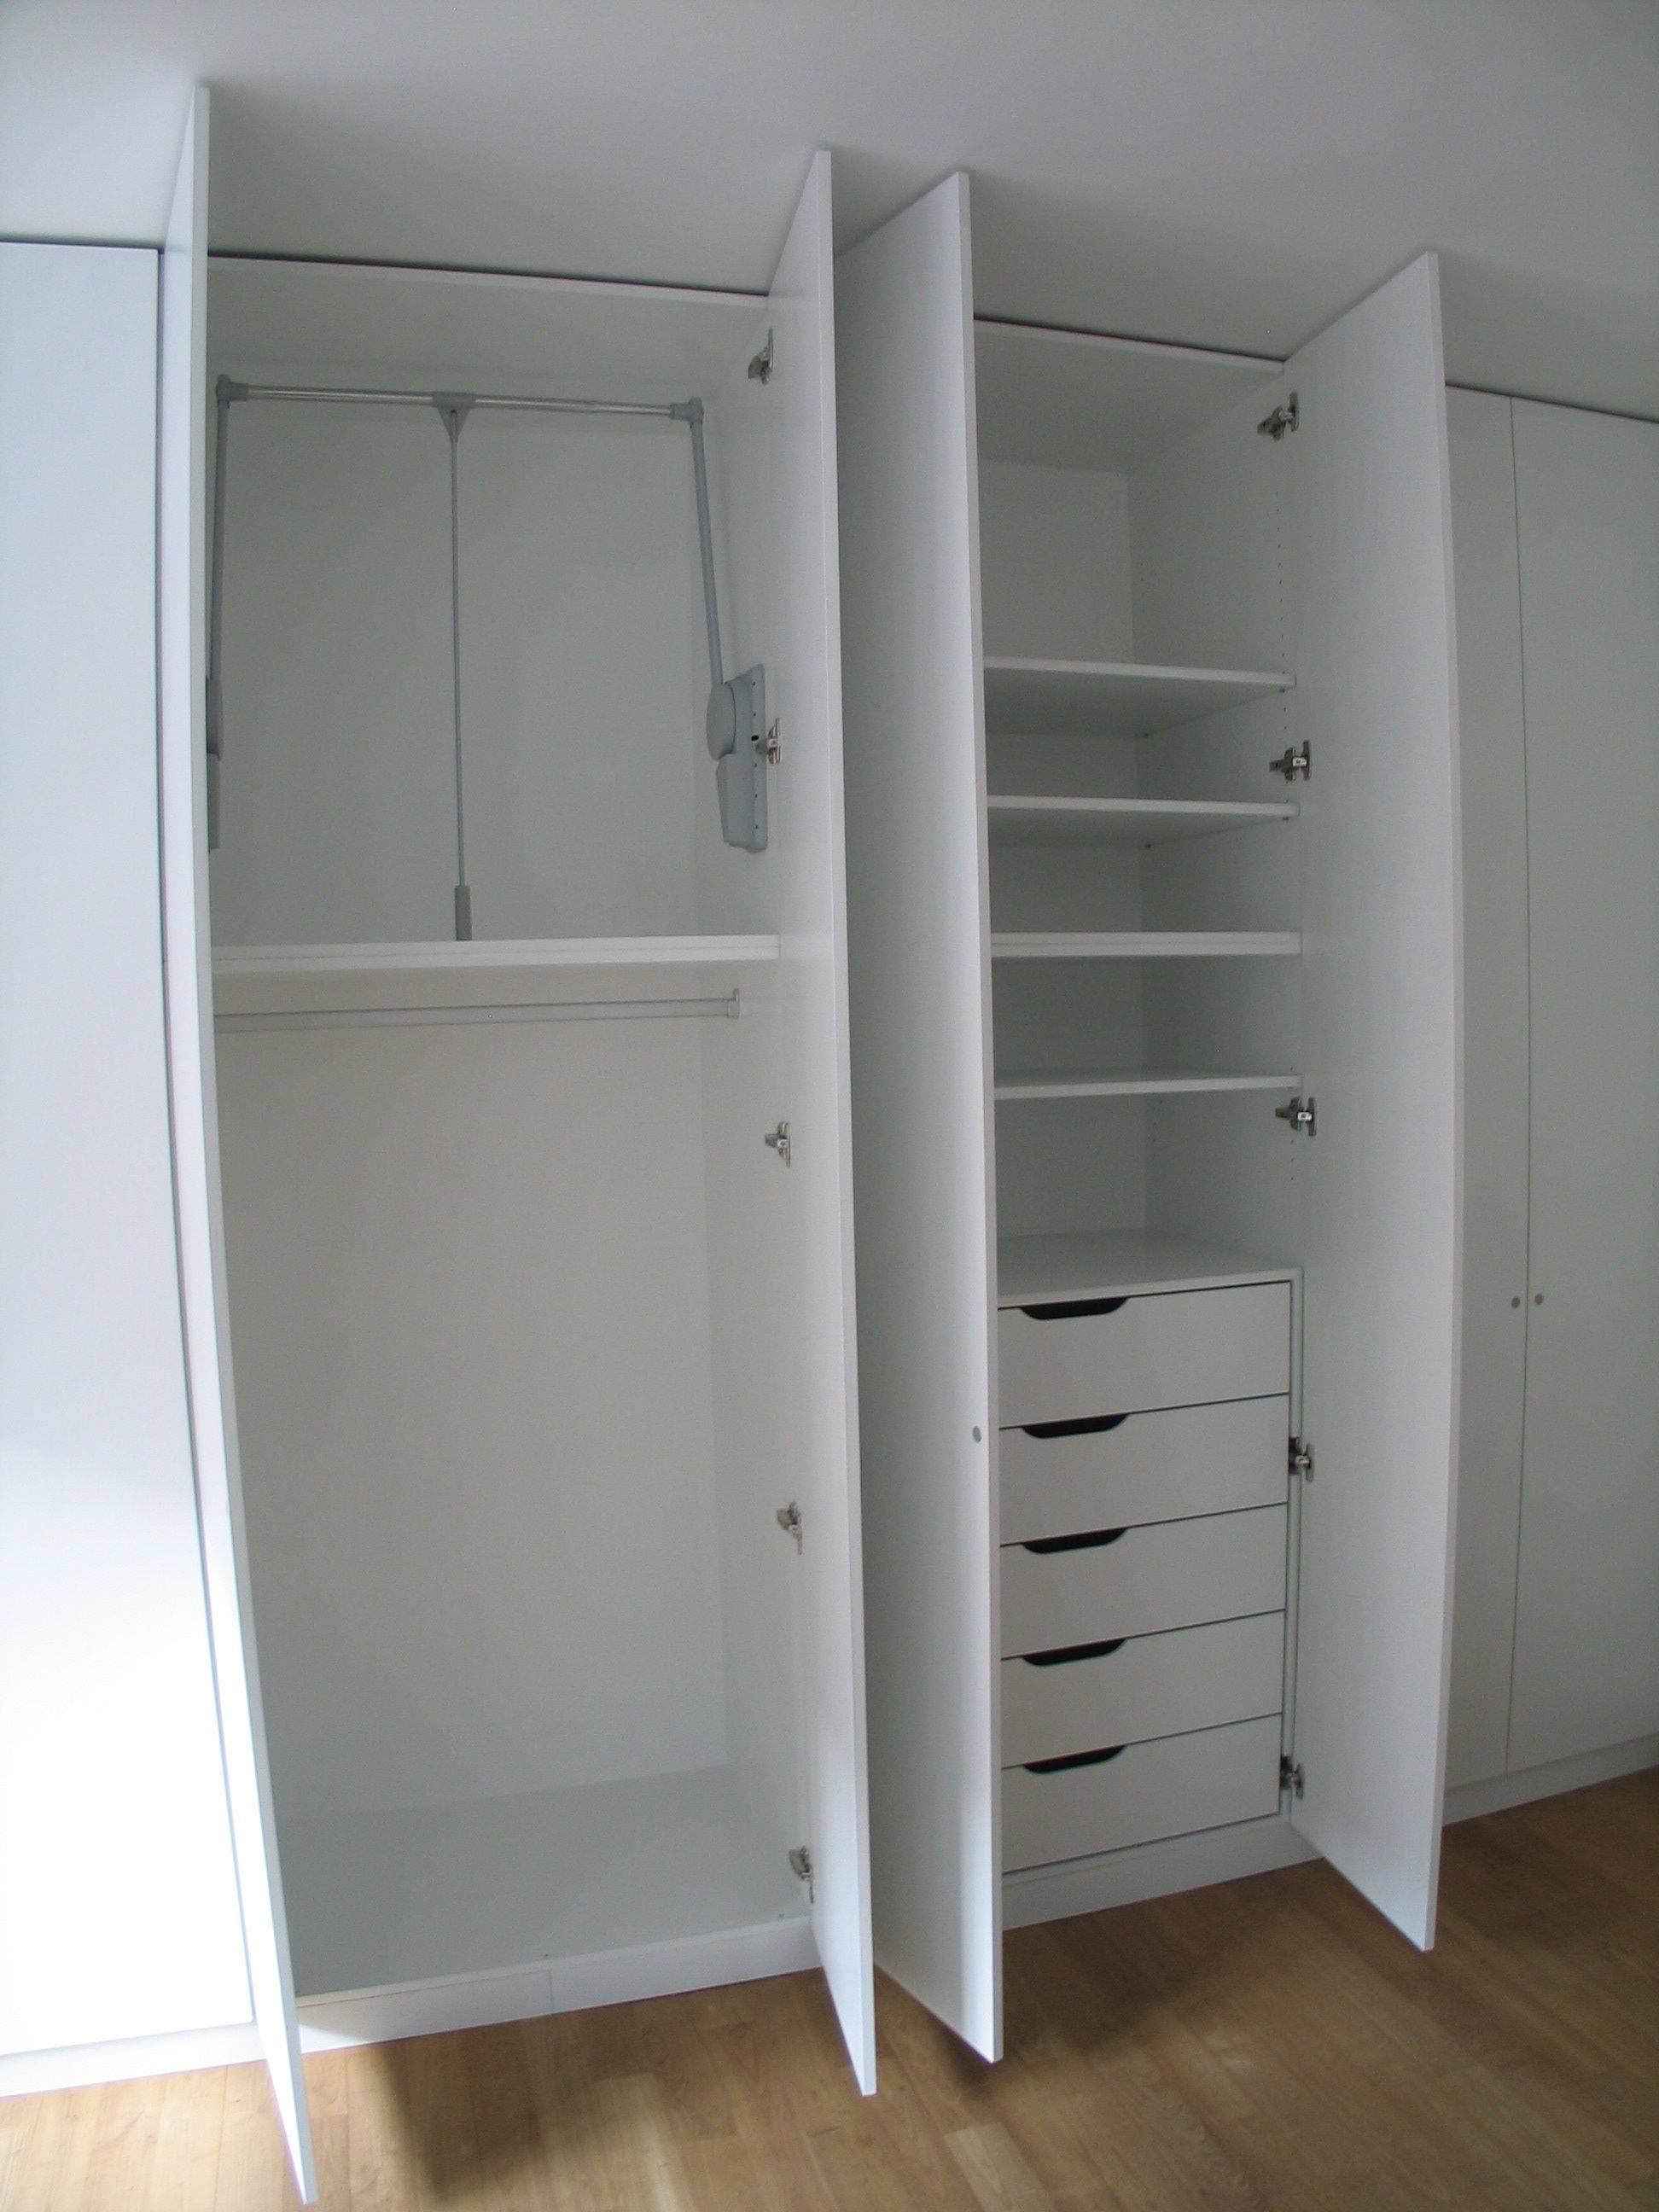 Wardrobe : 31 Marvelous White Wooden Wardrobe Photo Design White throughout White Wood Wardrobes With Drawers (Image 10 of 15)